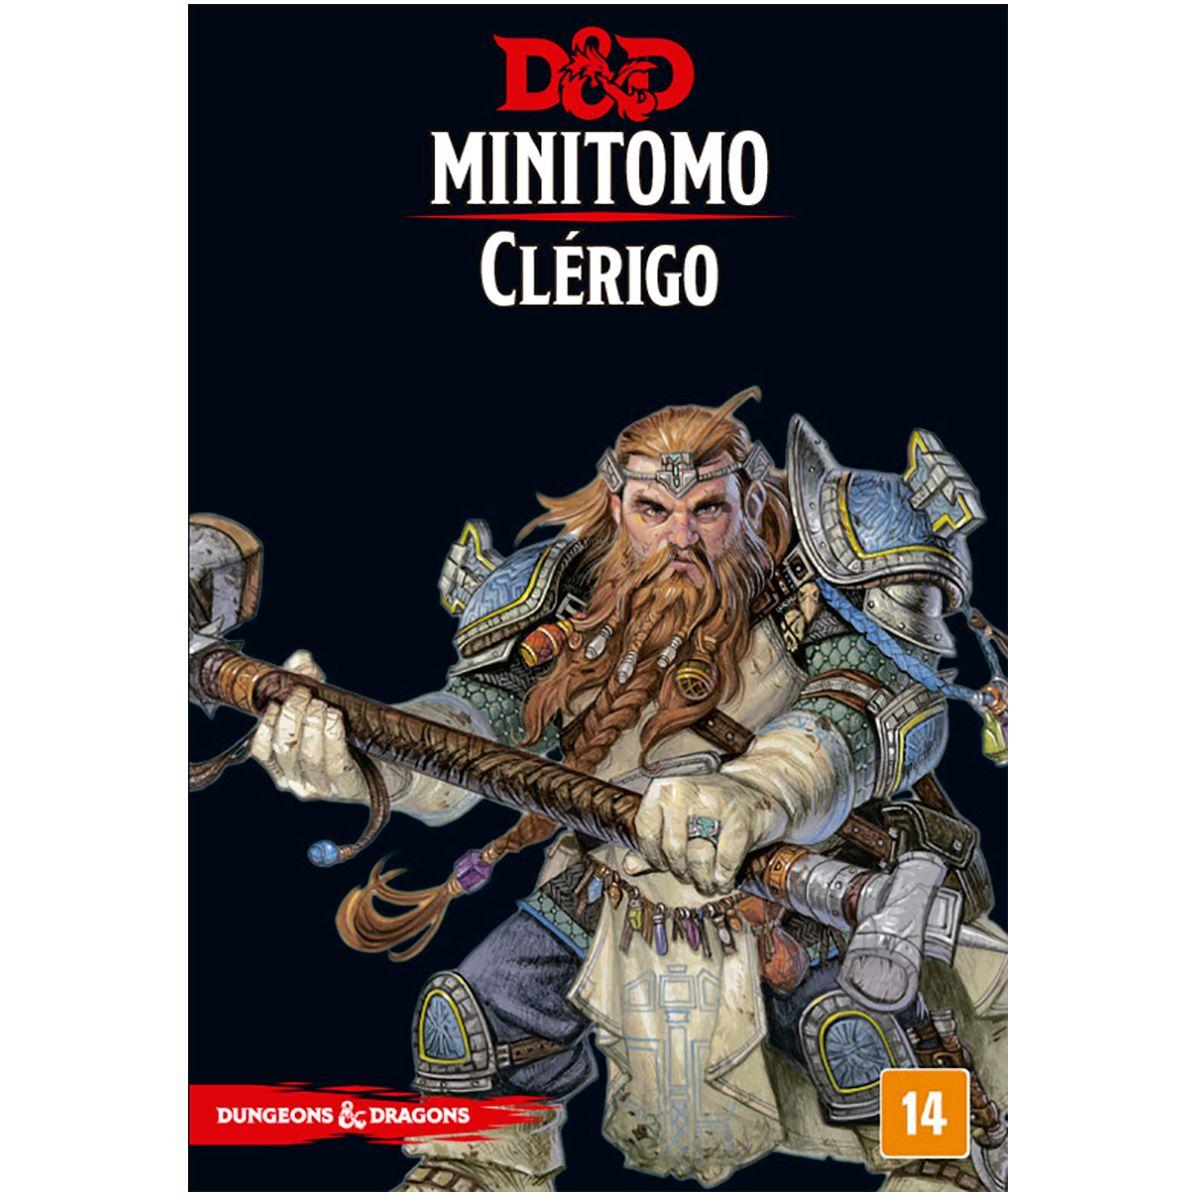 Dungeons and Dragons Minitomo Clérigo Deck RPG